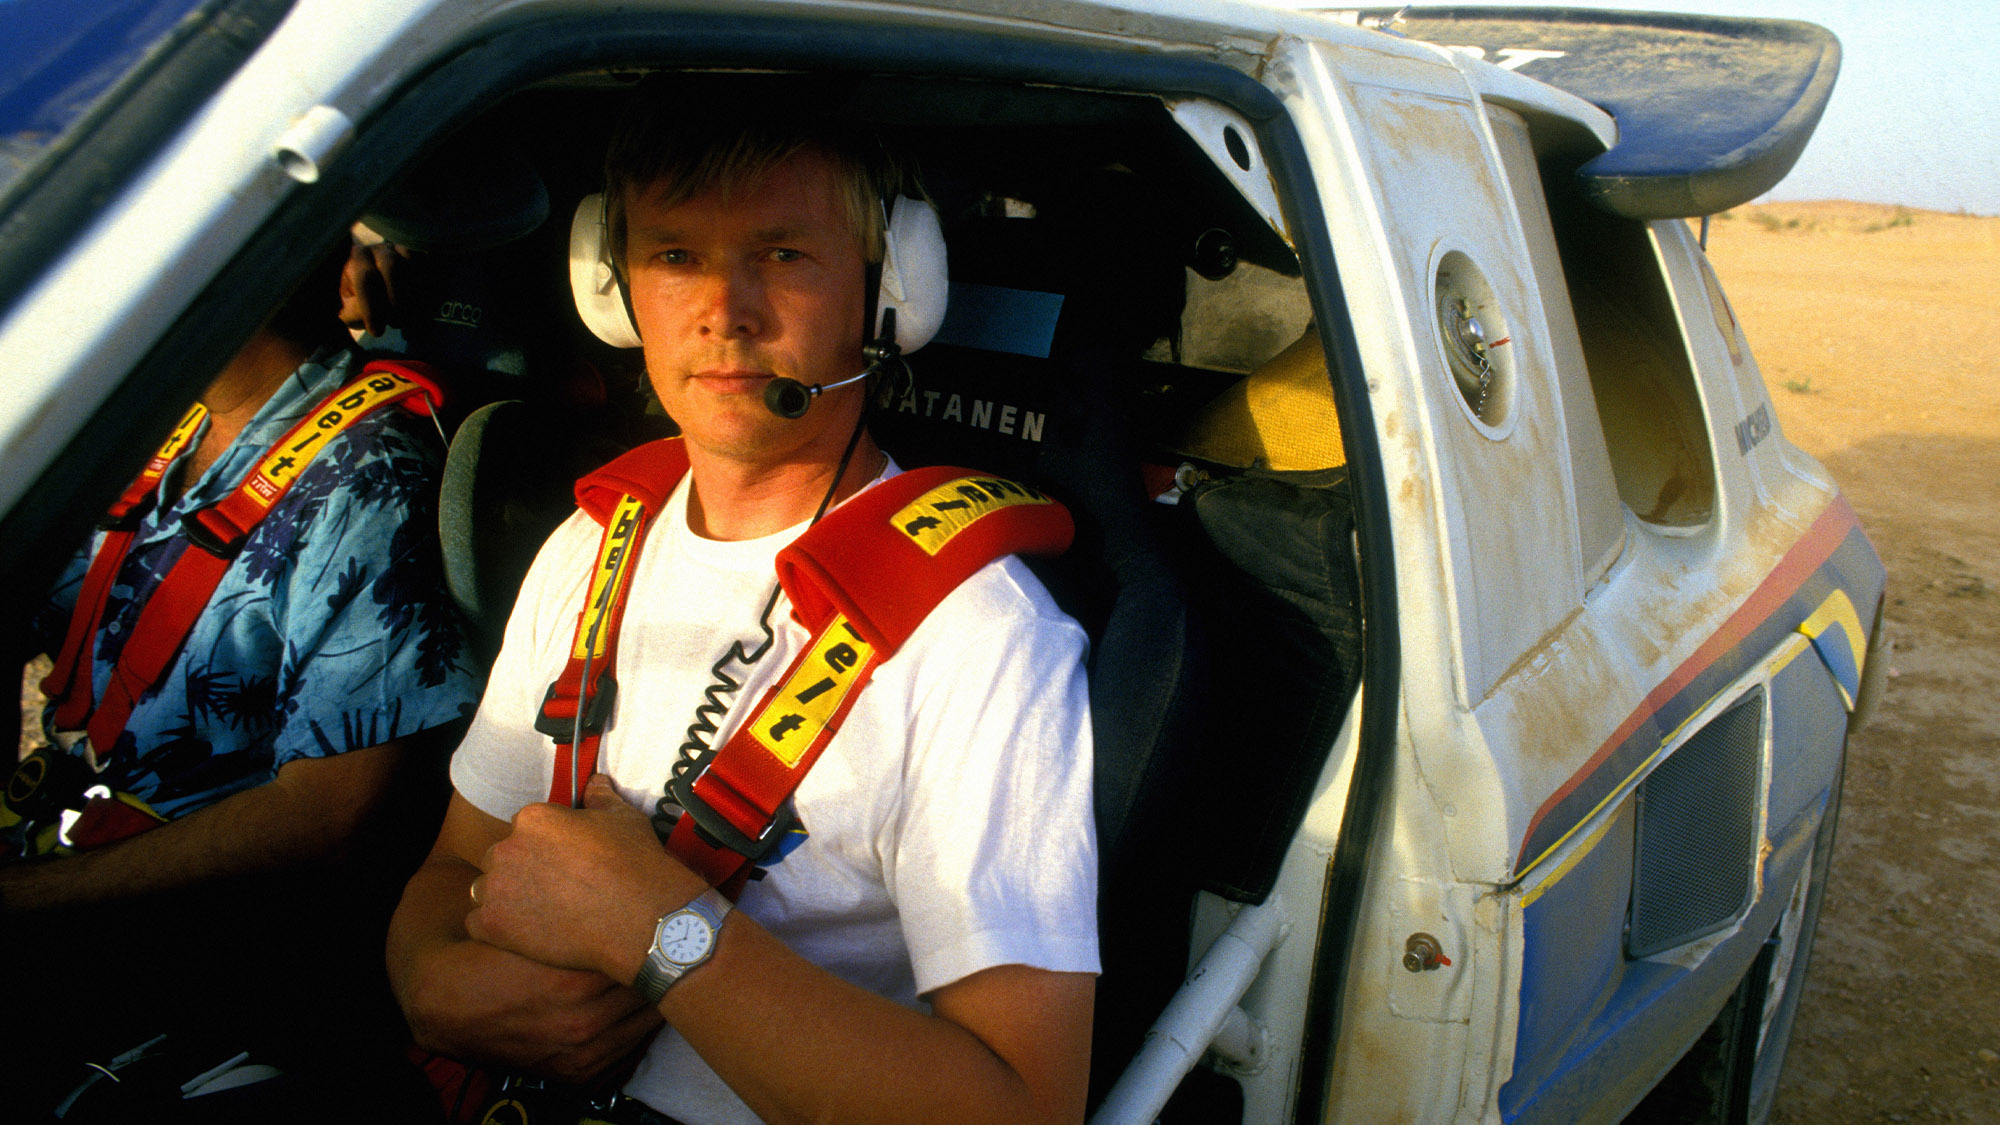 Ari Vatanen testing in his Peugeot 205 Turbo 16 for the 1986 Paris-Dakar